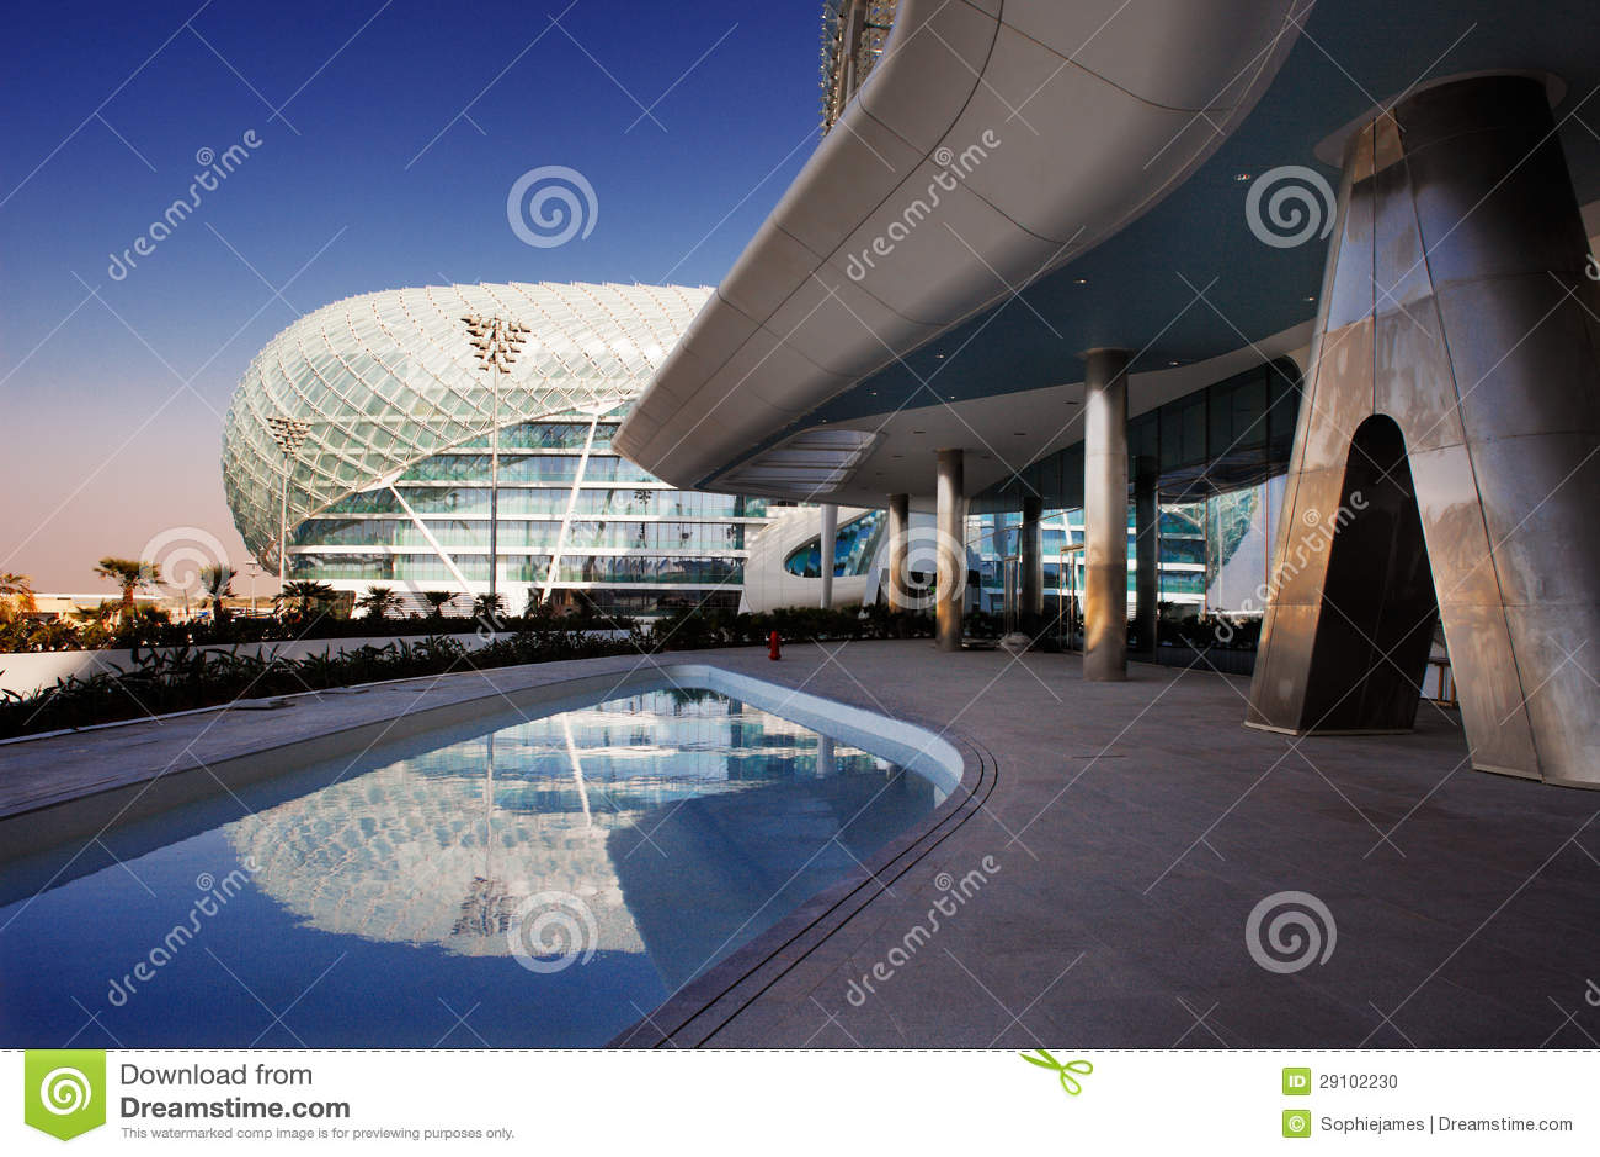 Esto es una obra maestra arquitectónica majestuosa